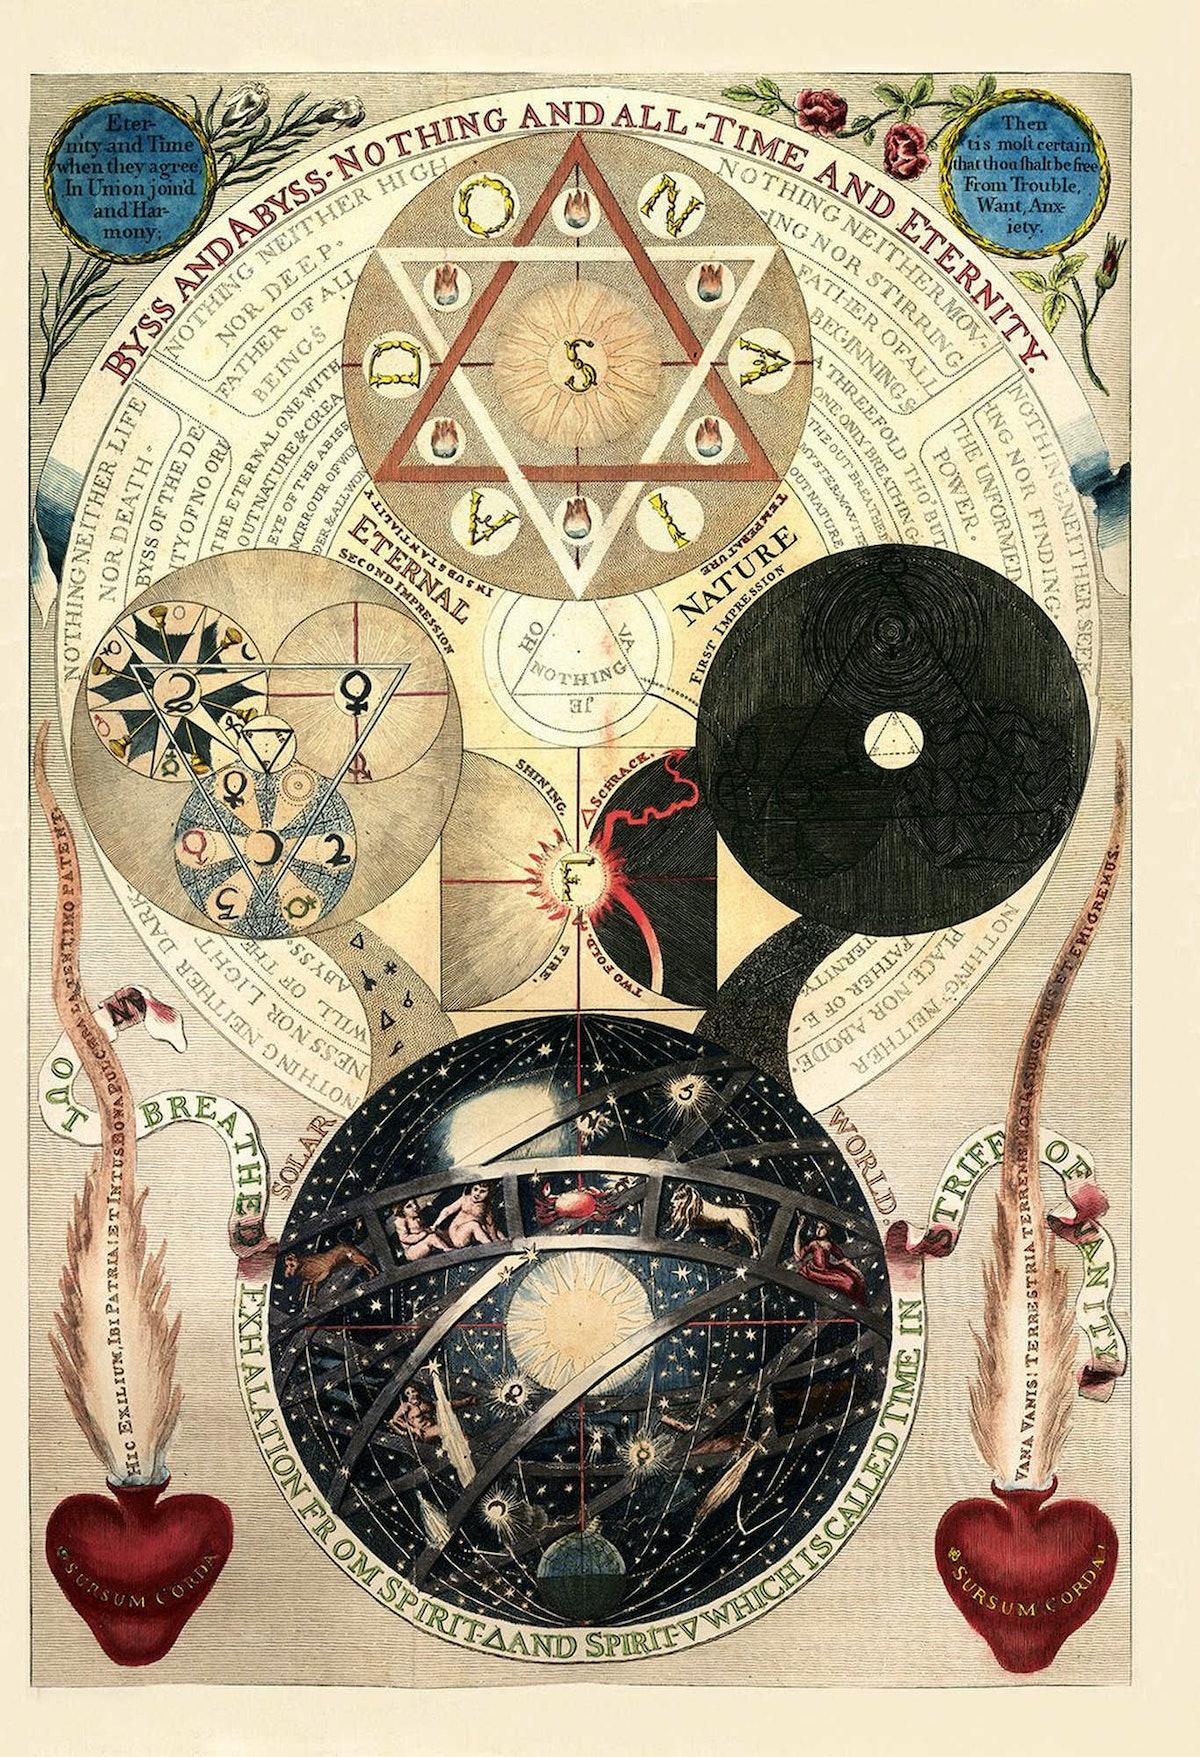 va_esoterica_astrology_p501_2010061249_id_1325628